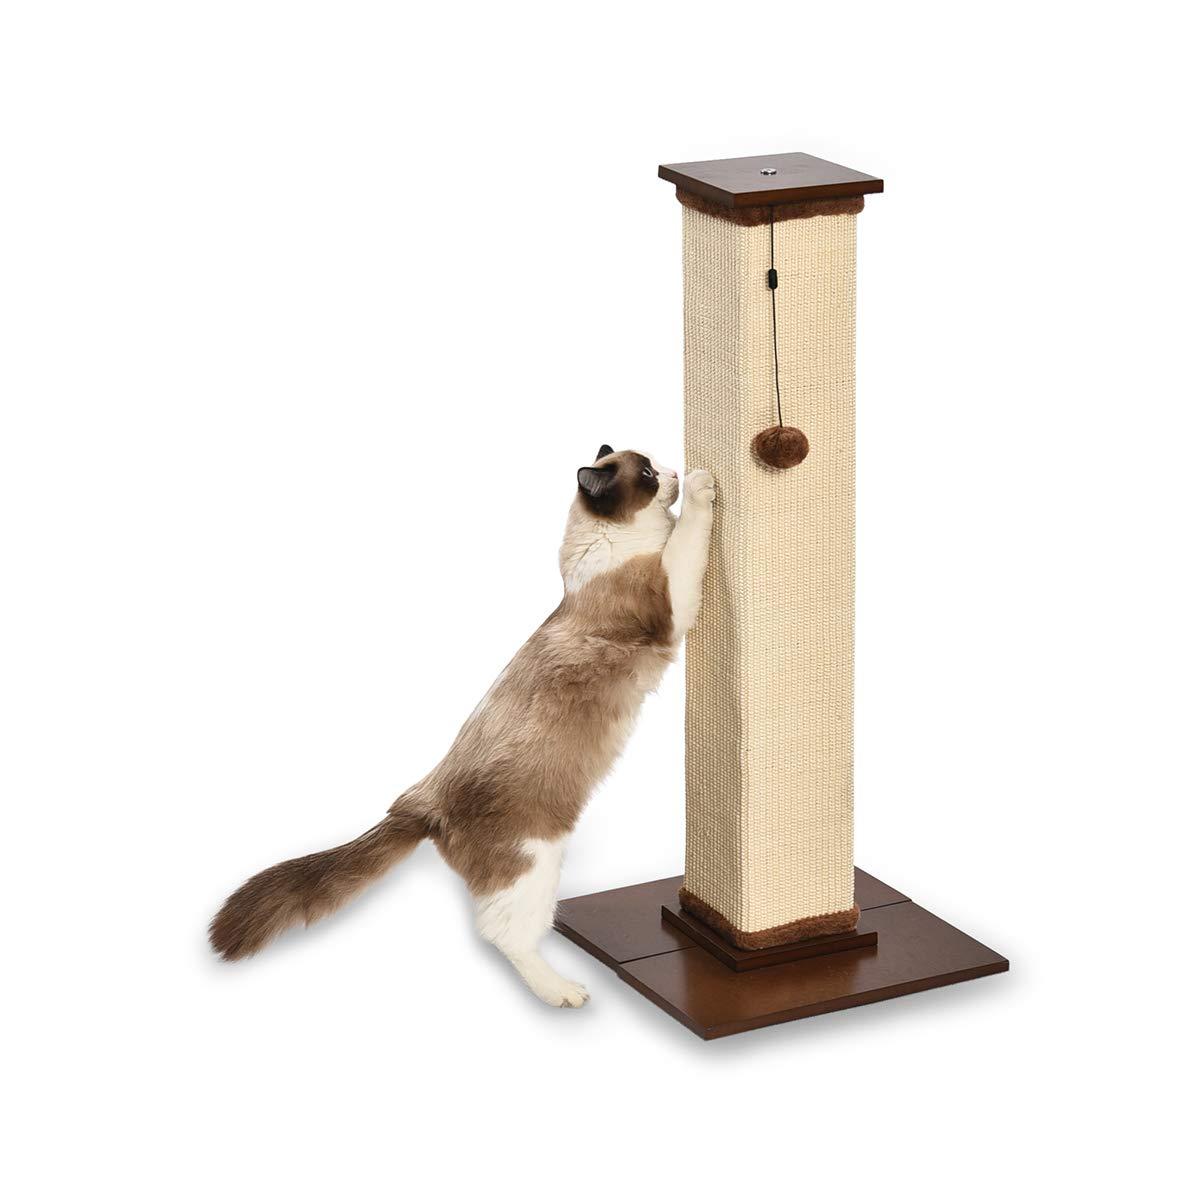 AmazonBasics Premium Cat Scratching Post - Large, Wood